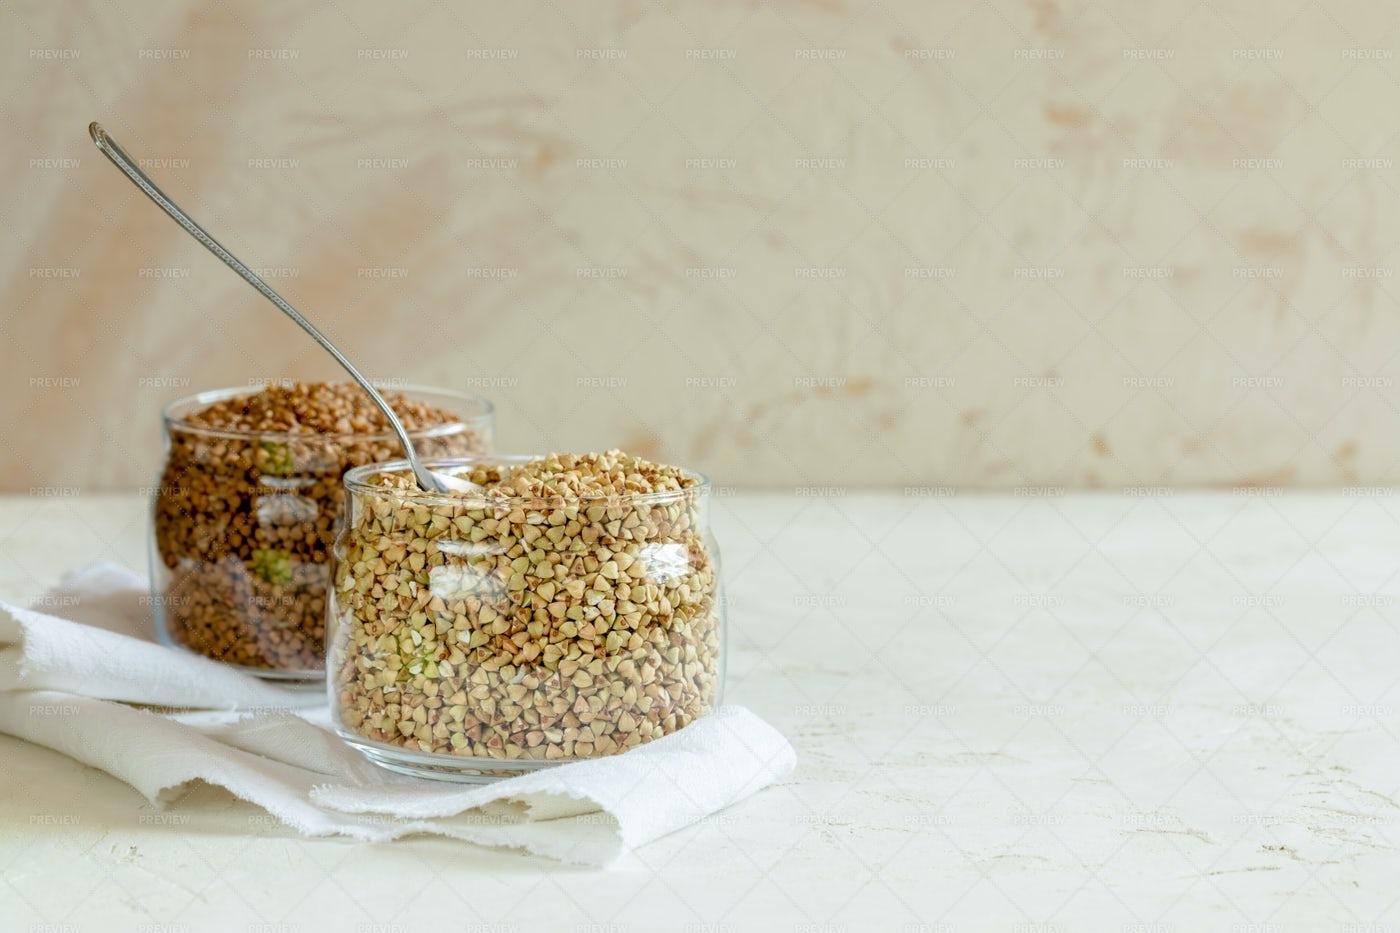 Buckwheat Grains With Copy Space: Stock Photos